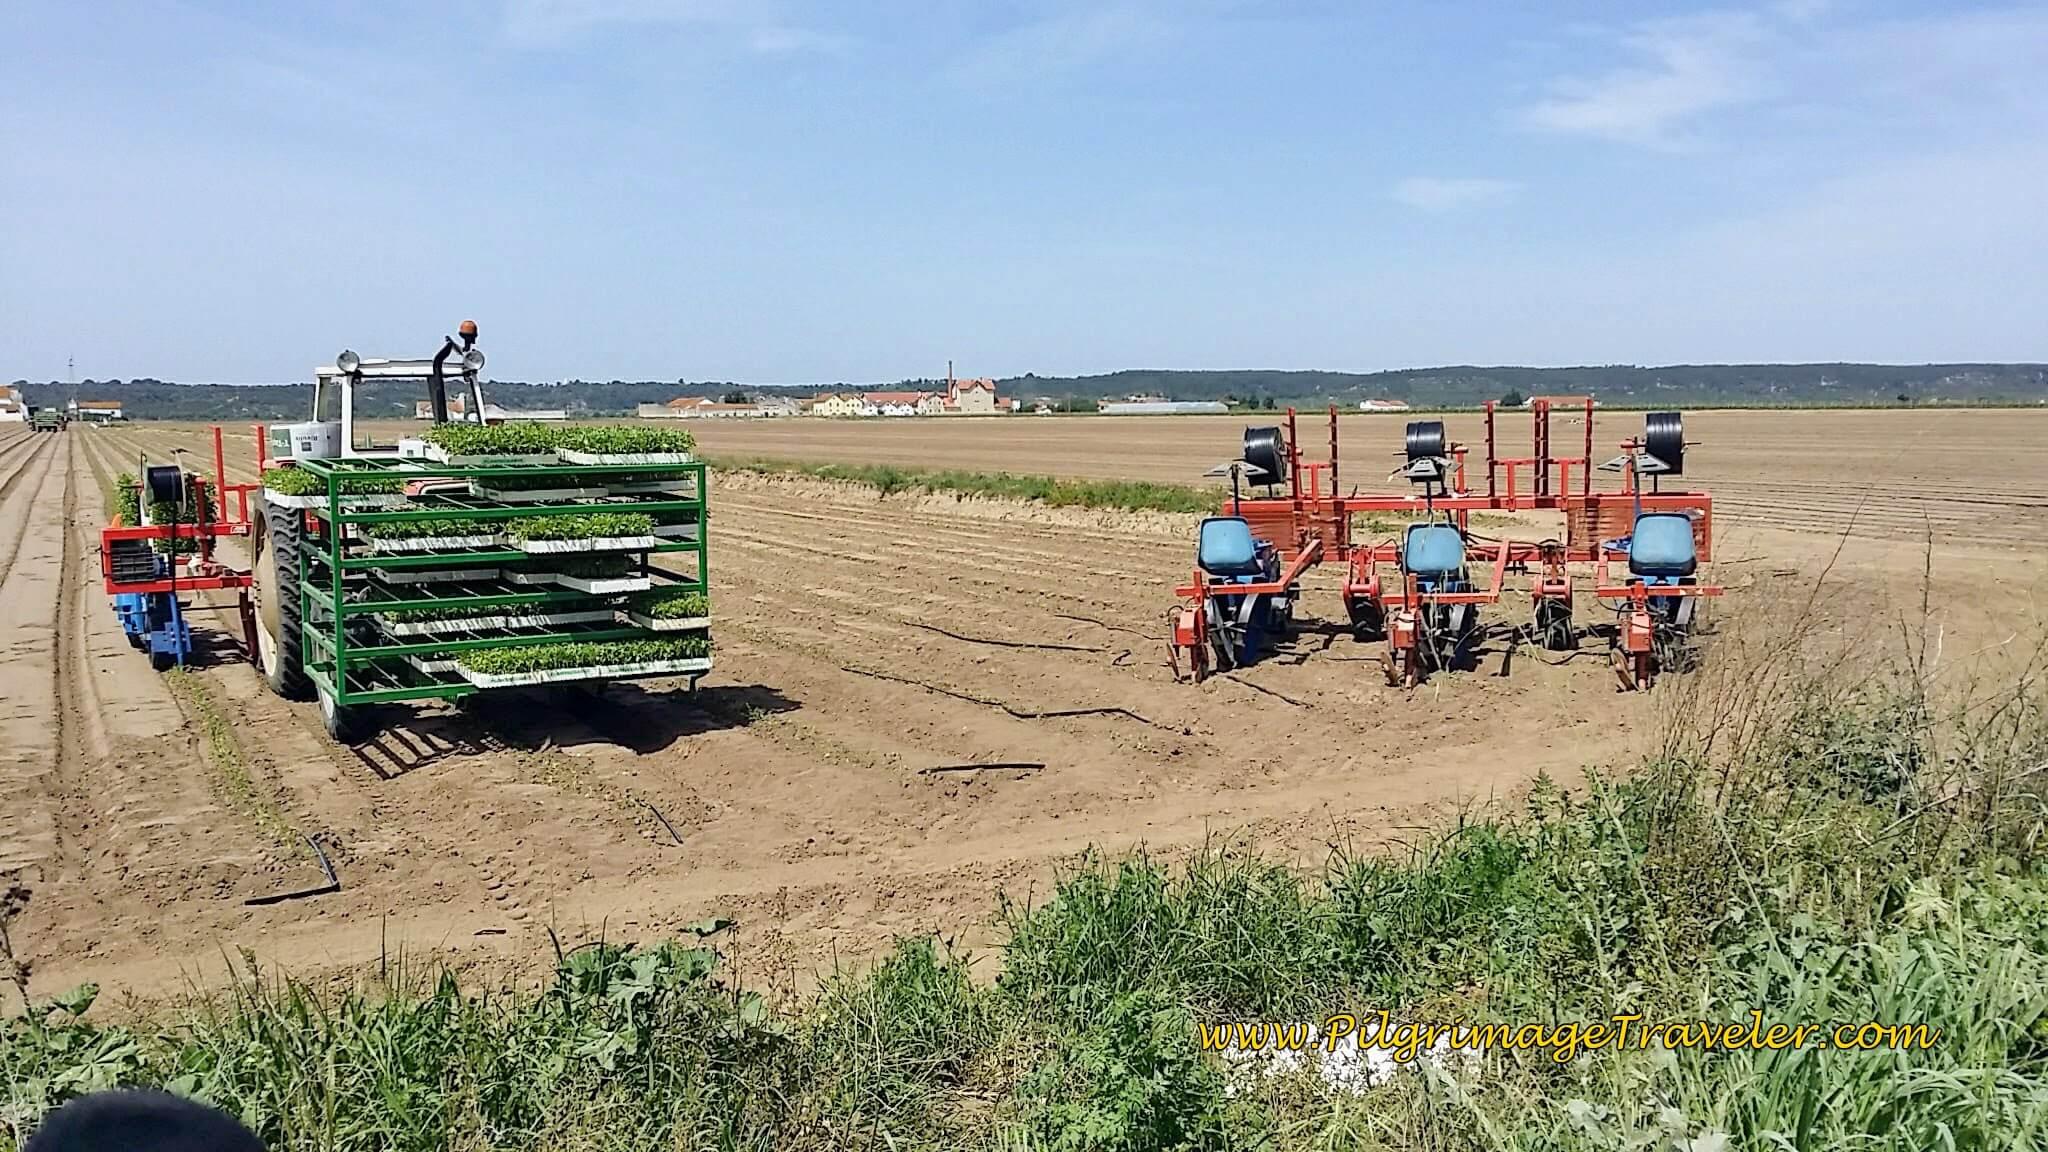 Portuguese Planting Equipment on the Camino near Santarém.